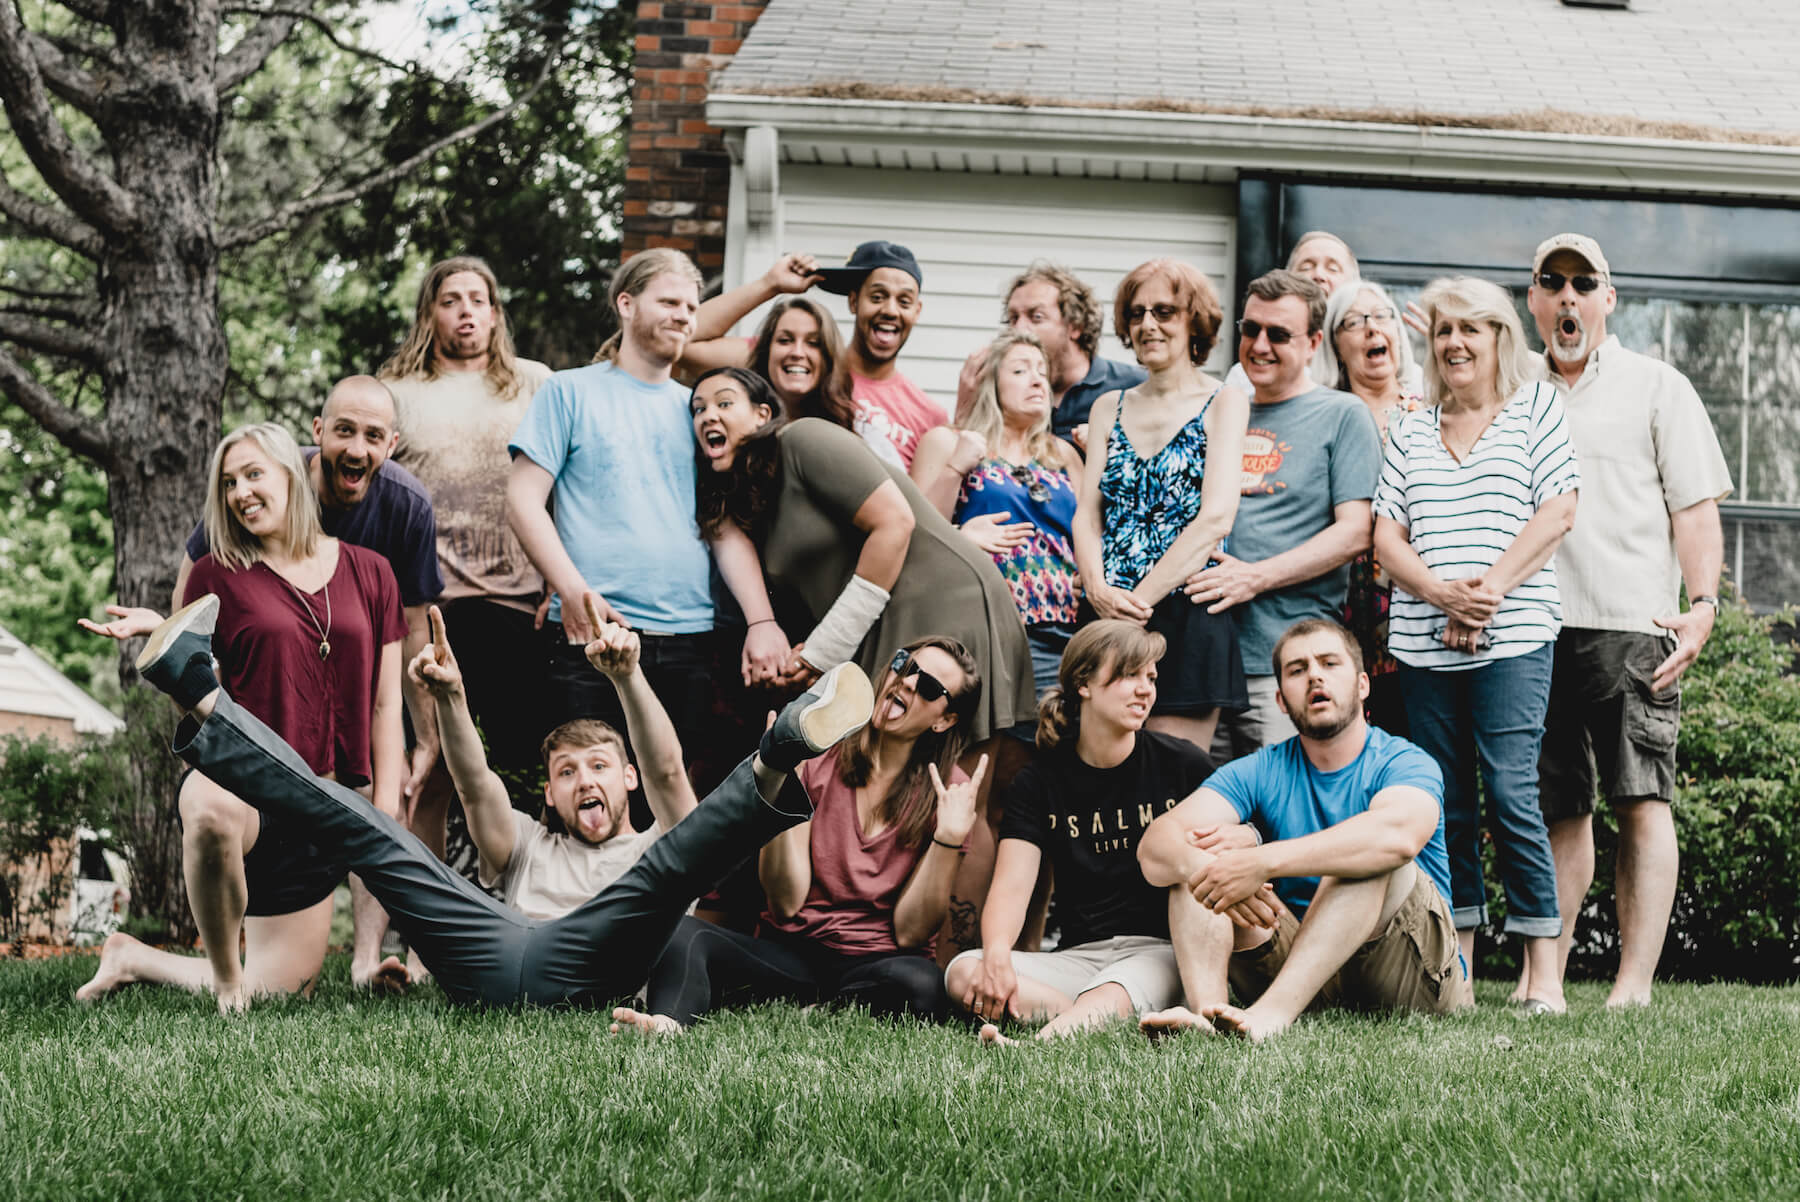 engle-olson-chicago-family-reunion-33.jpg